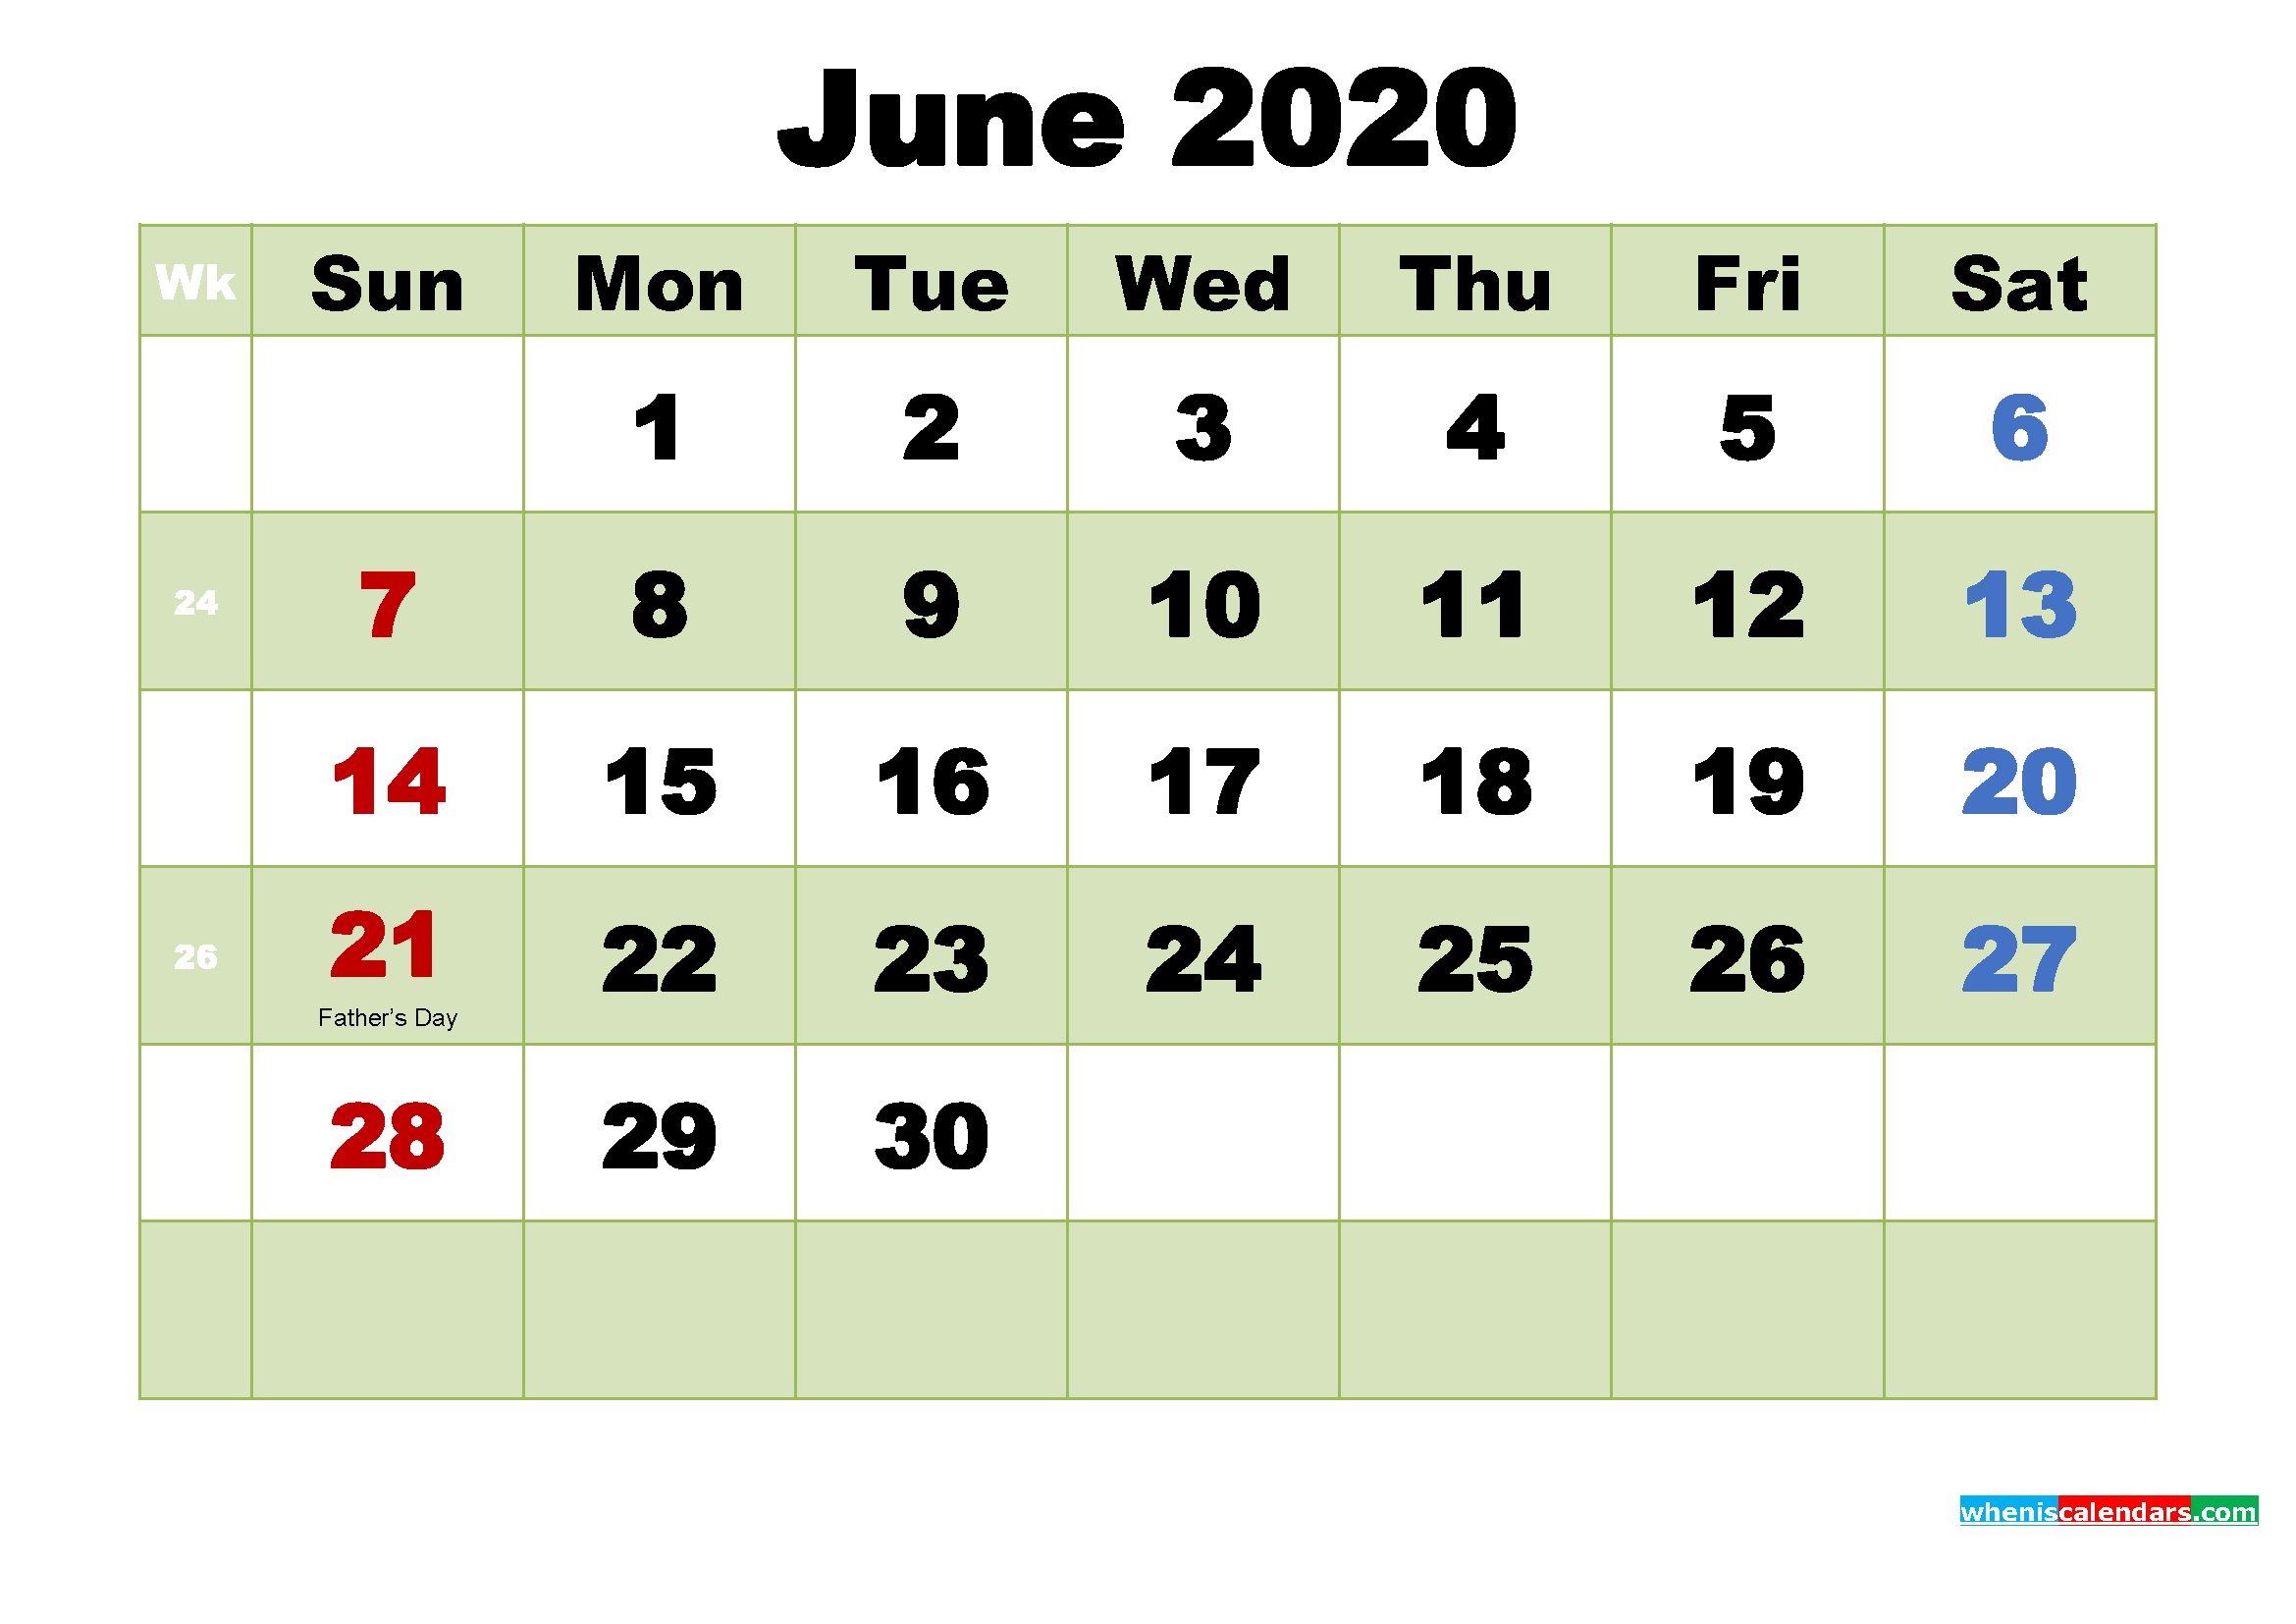 Printable 2020 Calendar by Month June